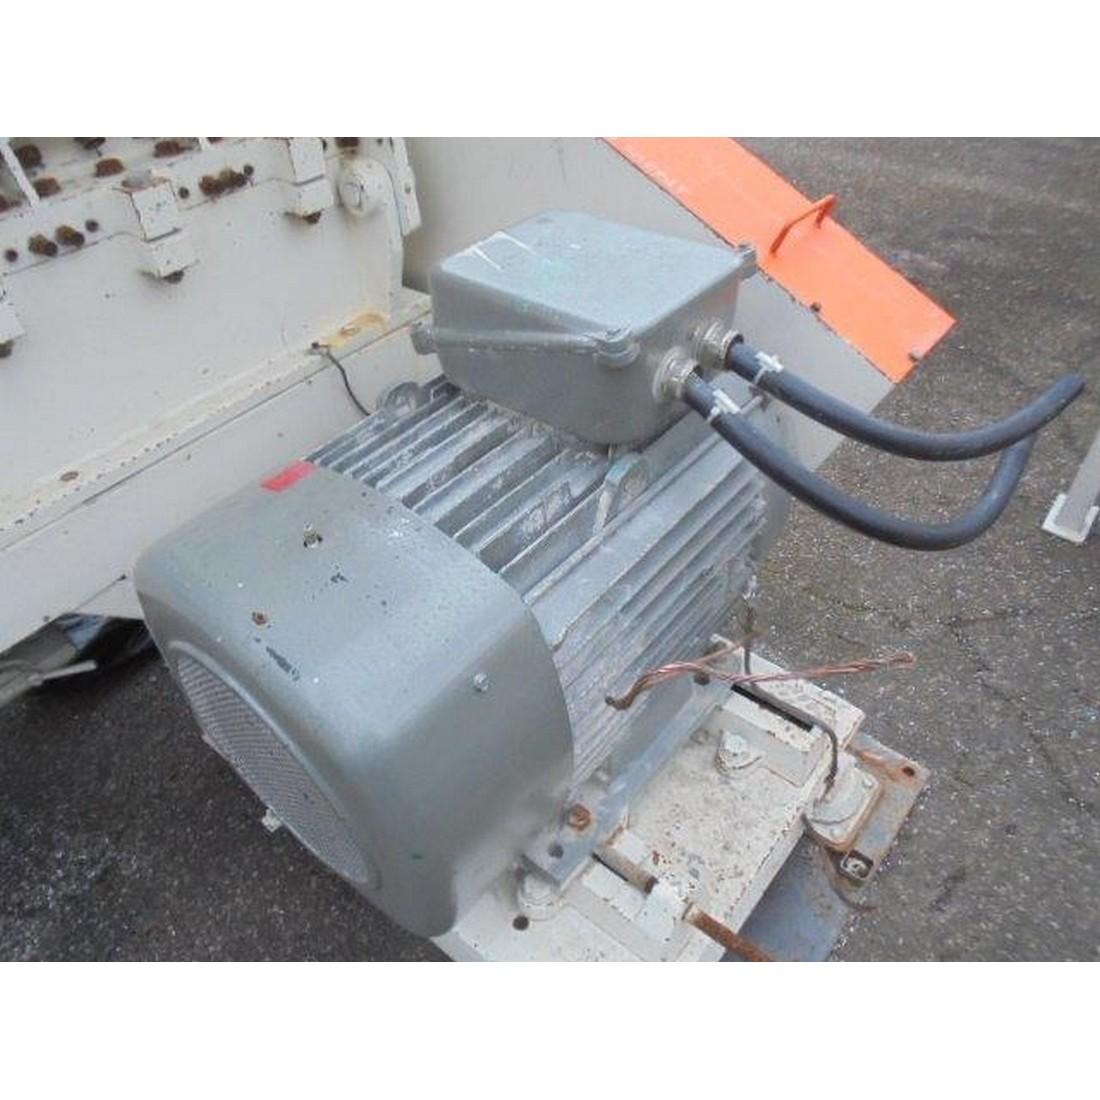 R6BE888 Mild steel PALLMANN blade mill - Type Ps4-12-1/2 - 90kw/hp120